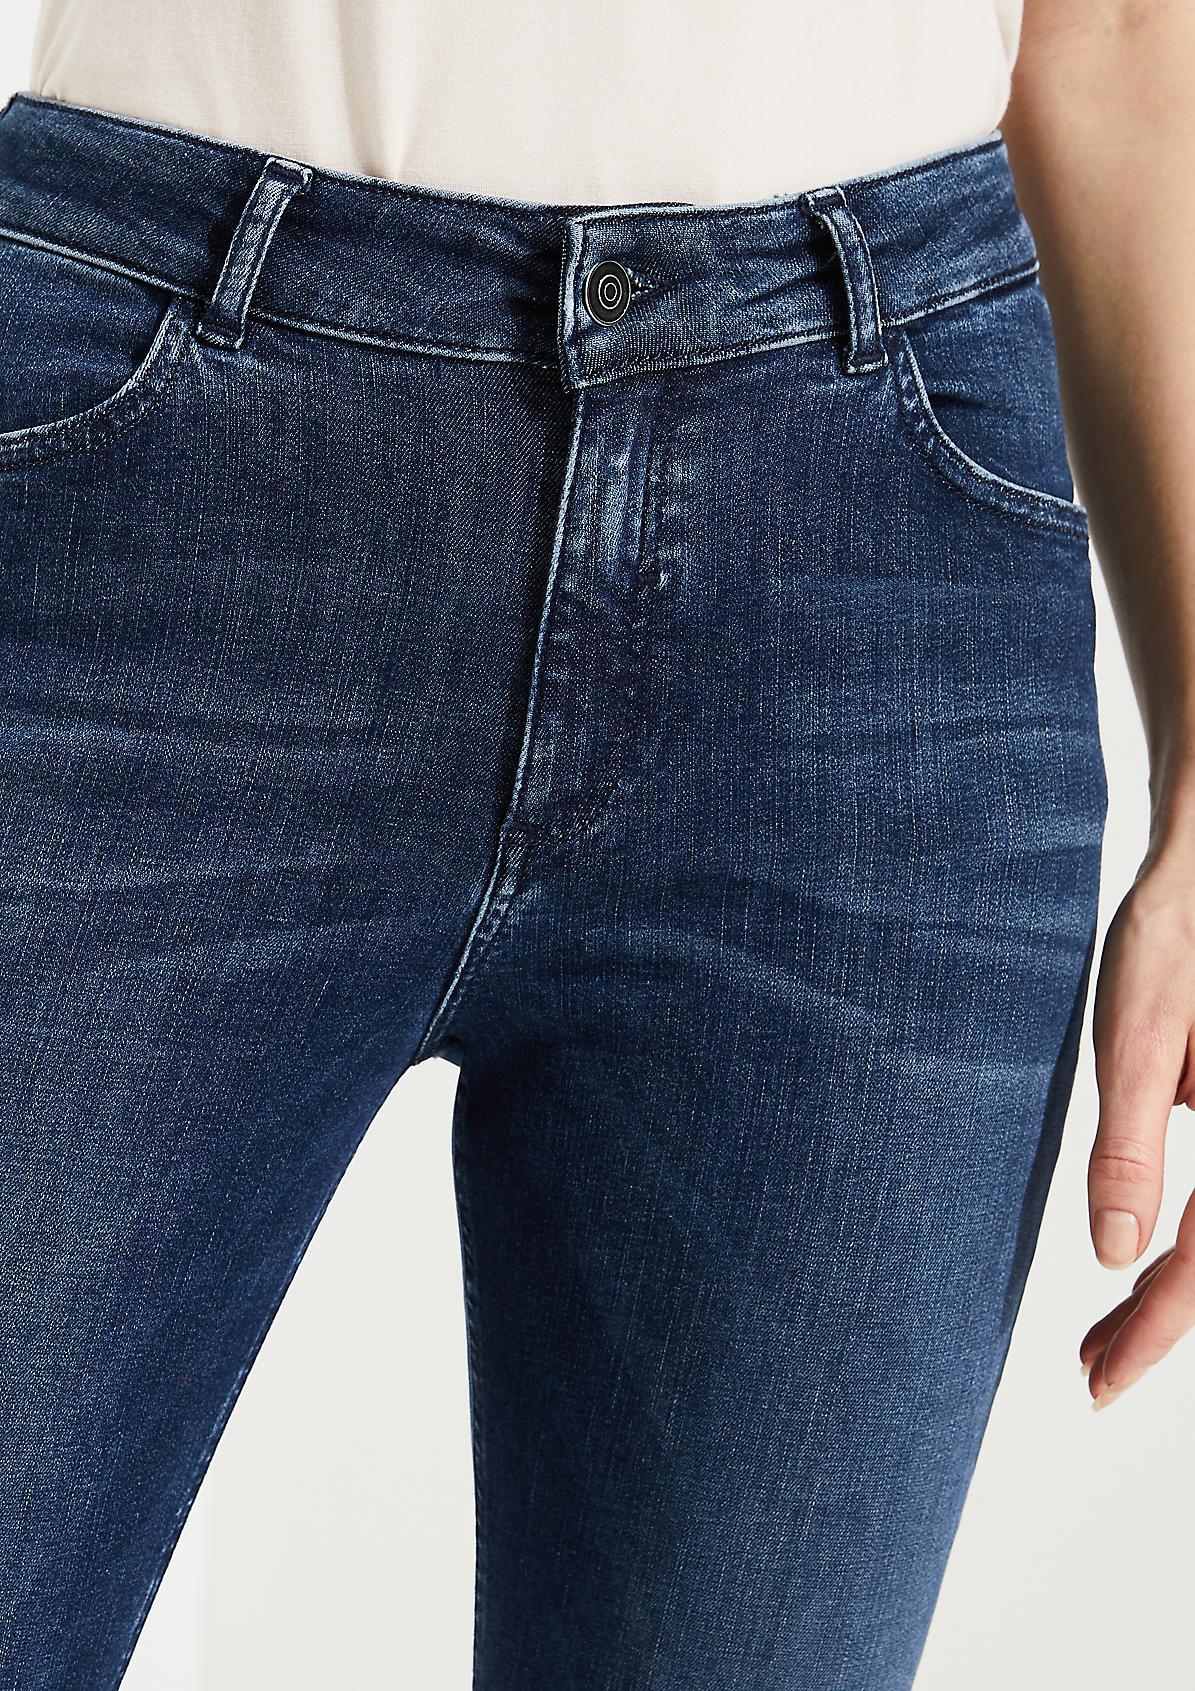 Slim Fit: Skinny leg-Jeans